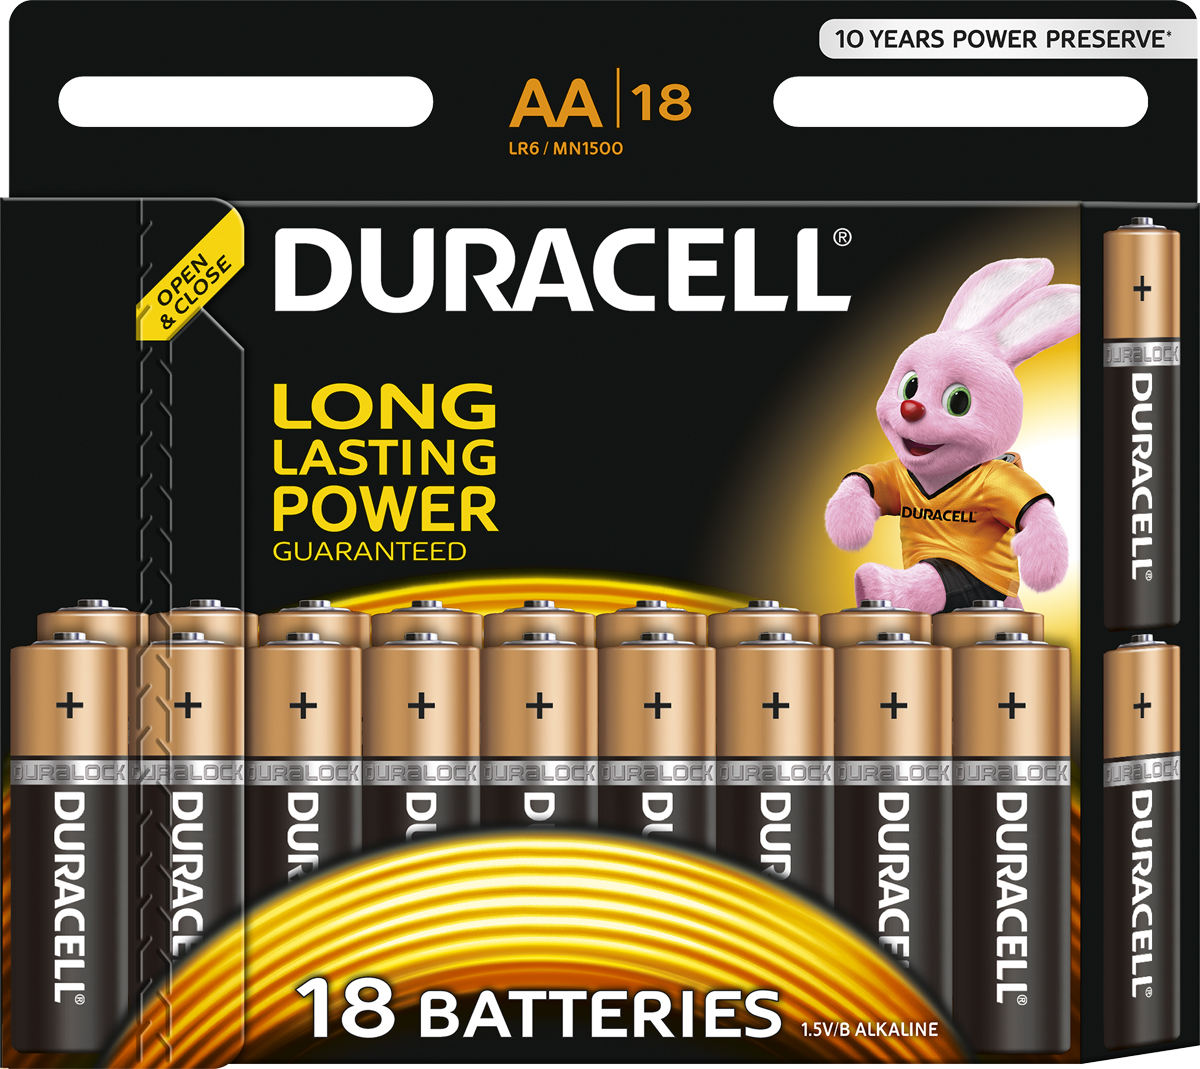 Набор щелочных батареек Duracell Basic, тип АА, 18 шт аккумуляторы duracell hr06 aa